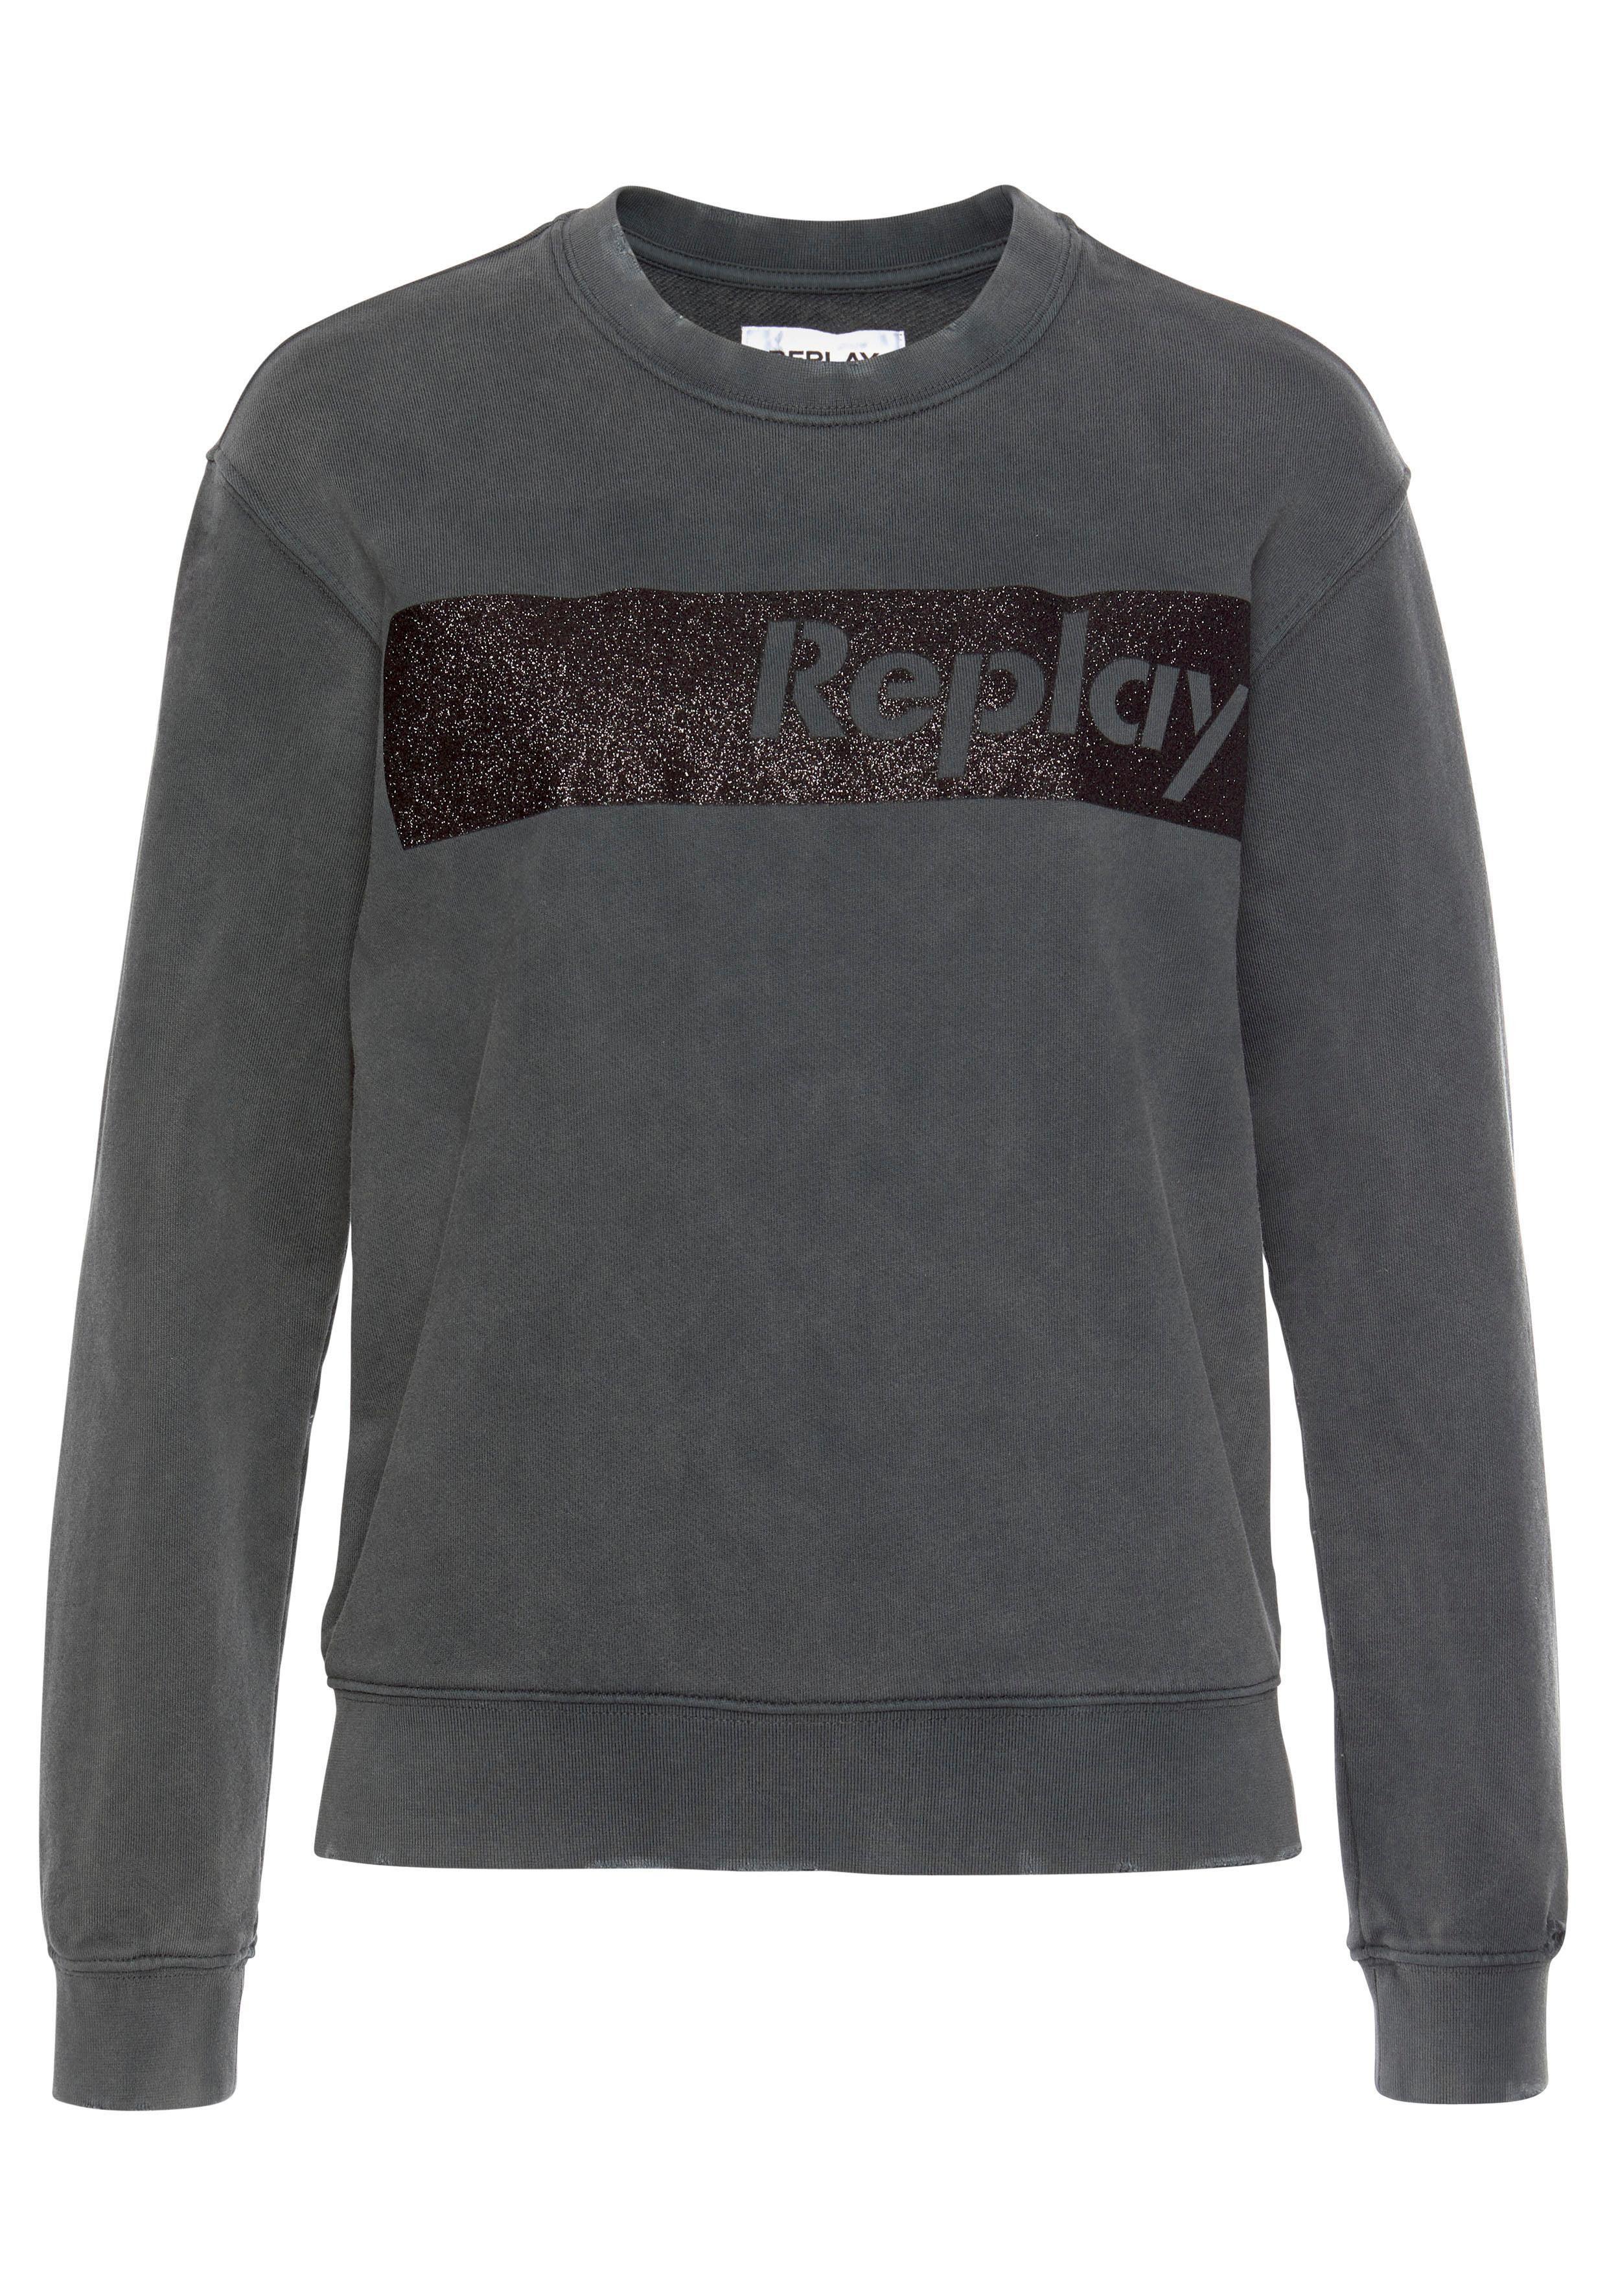 Replay Sweatshirt Mit Glitzerndem Blockprint